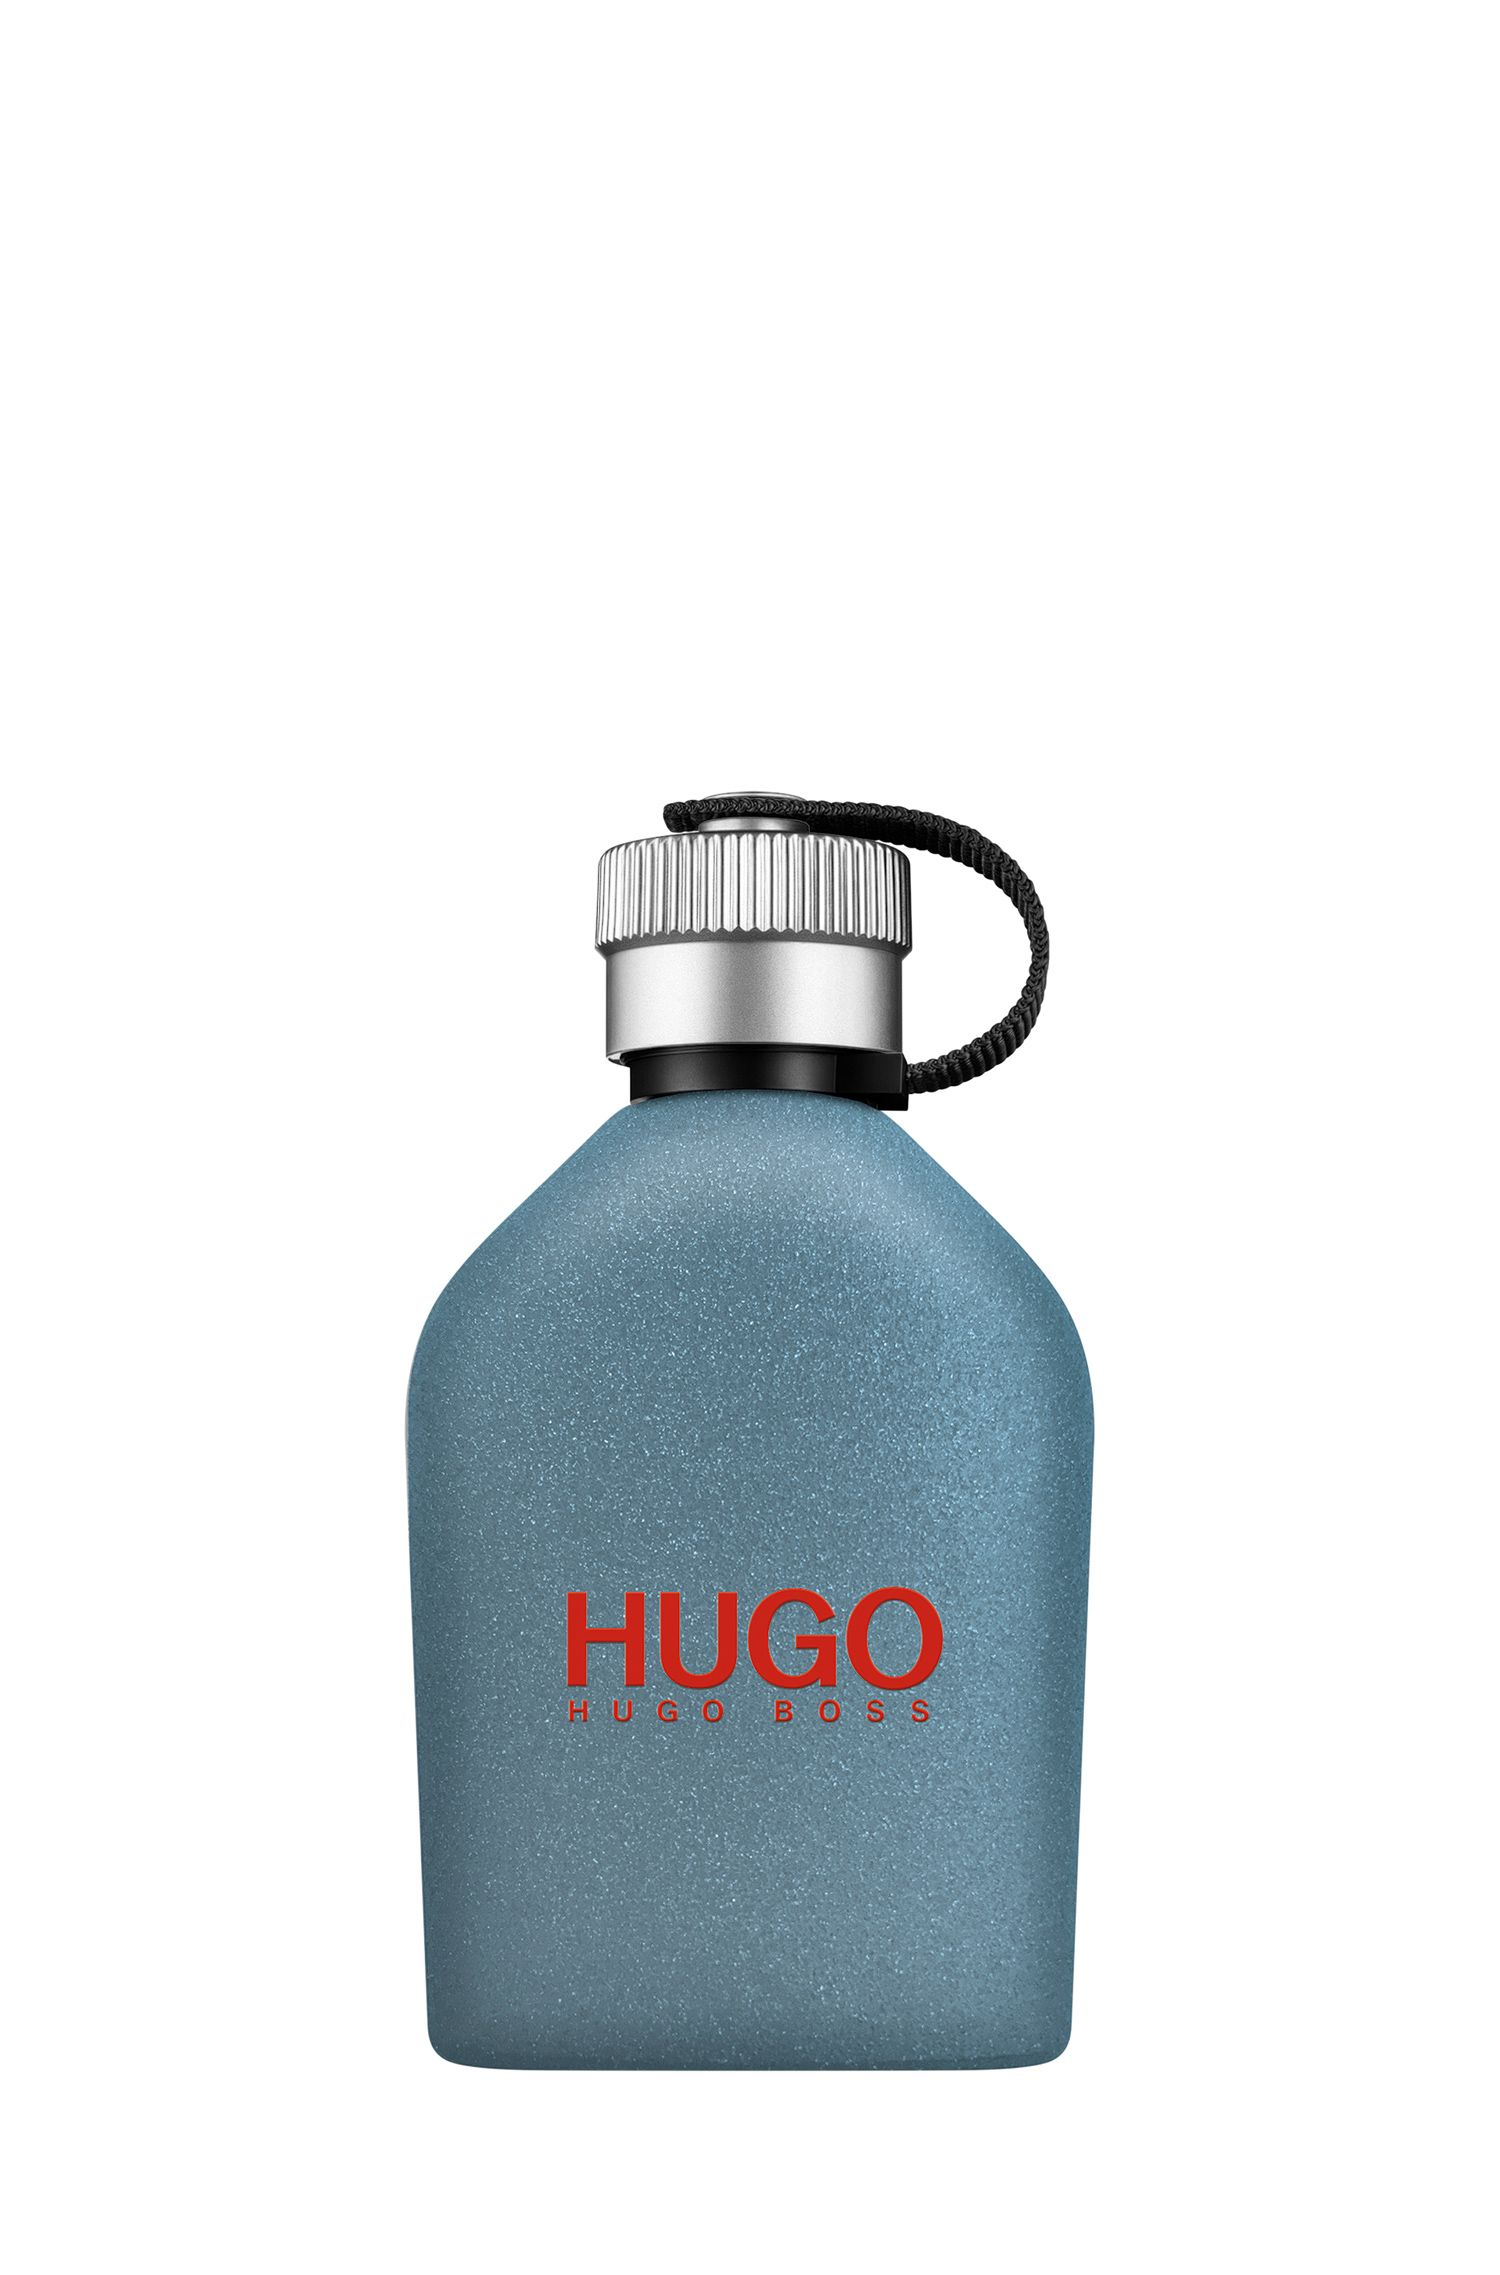 HUGO Urban Journey 125ml eau de toilette, Assorted-Pre-Pack